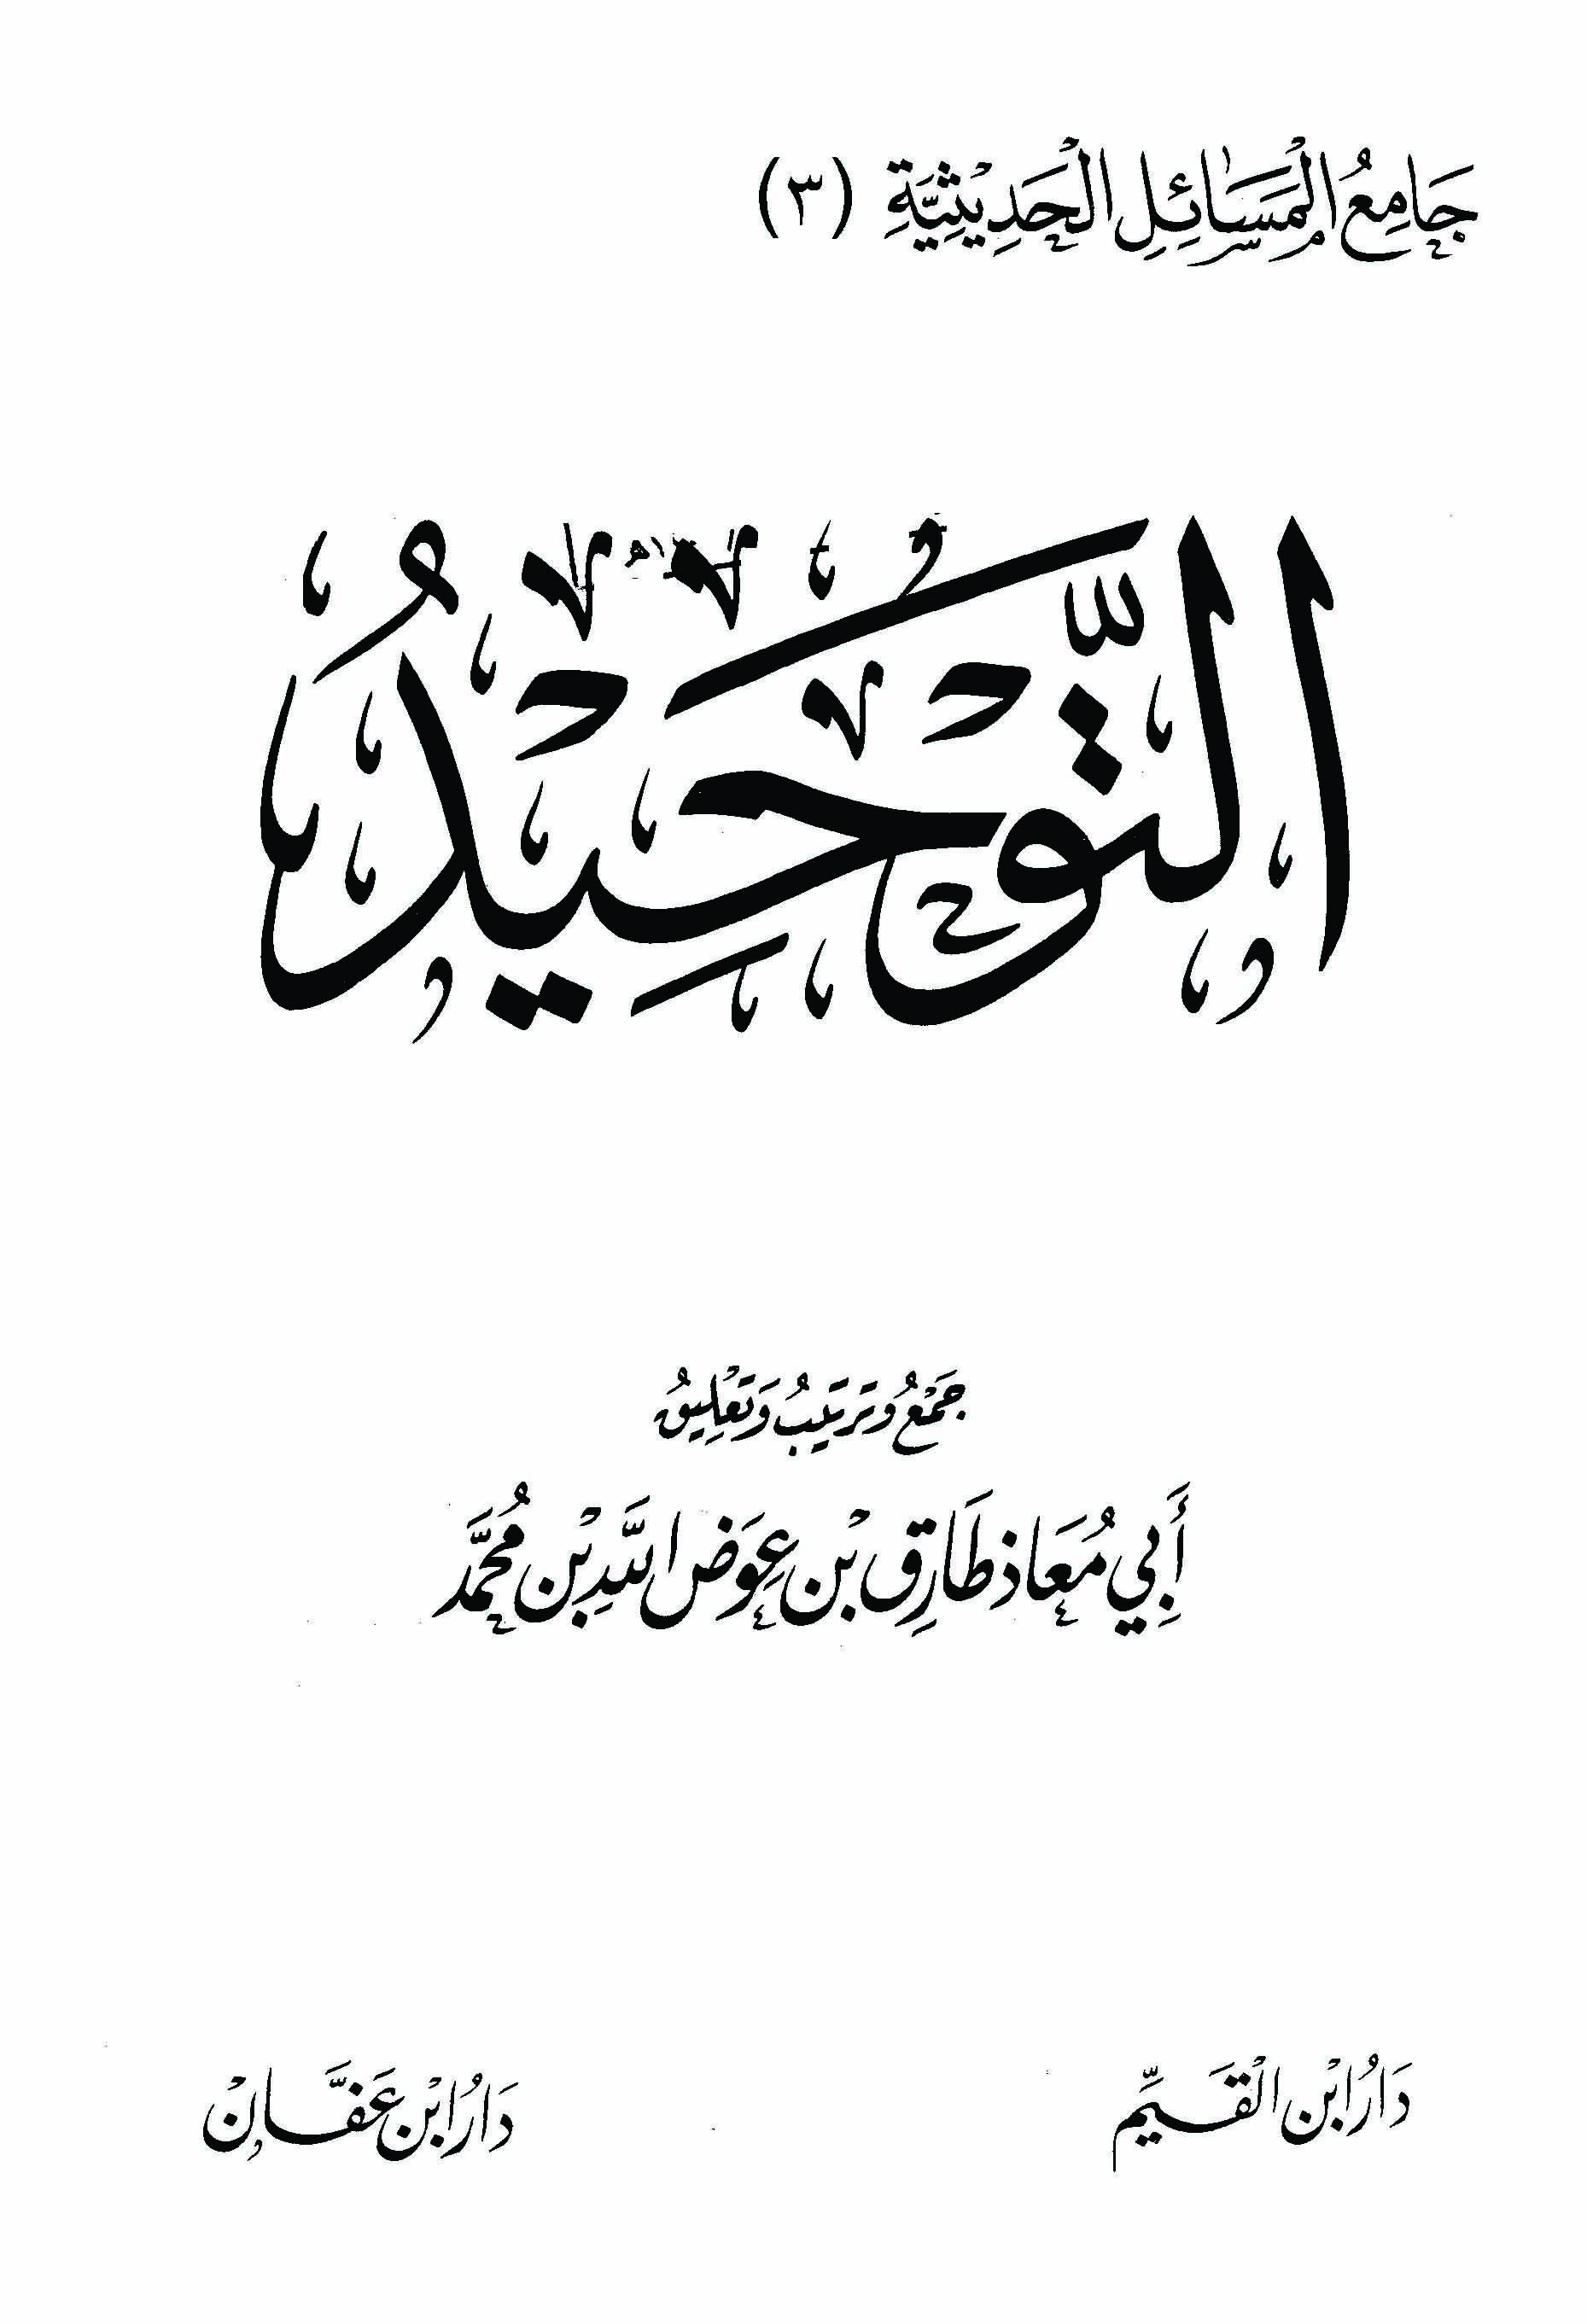 كتاب التوحيد ابي معاذ طارق Pdf Calligraphy Arabic Calligraphy